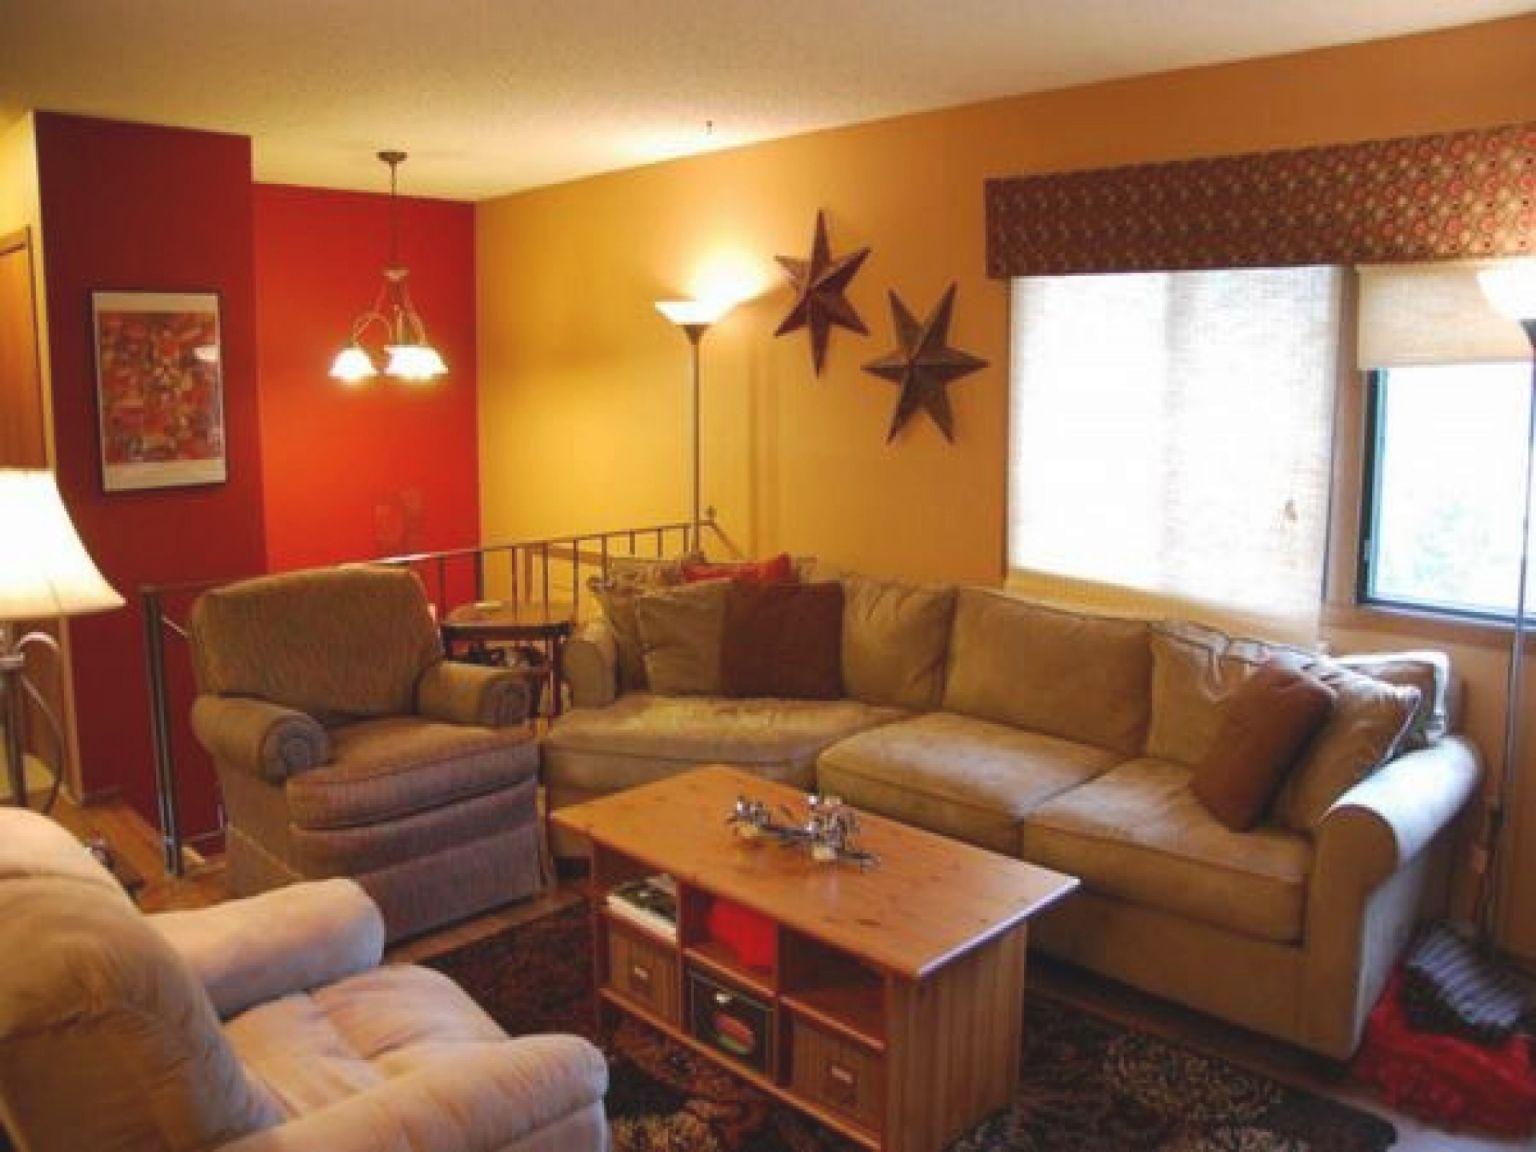 Interior Design Yellow Walls Living Room - Appealhome throughout Unique Yellow Walls Living Room Interior Decor